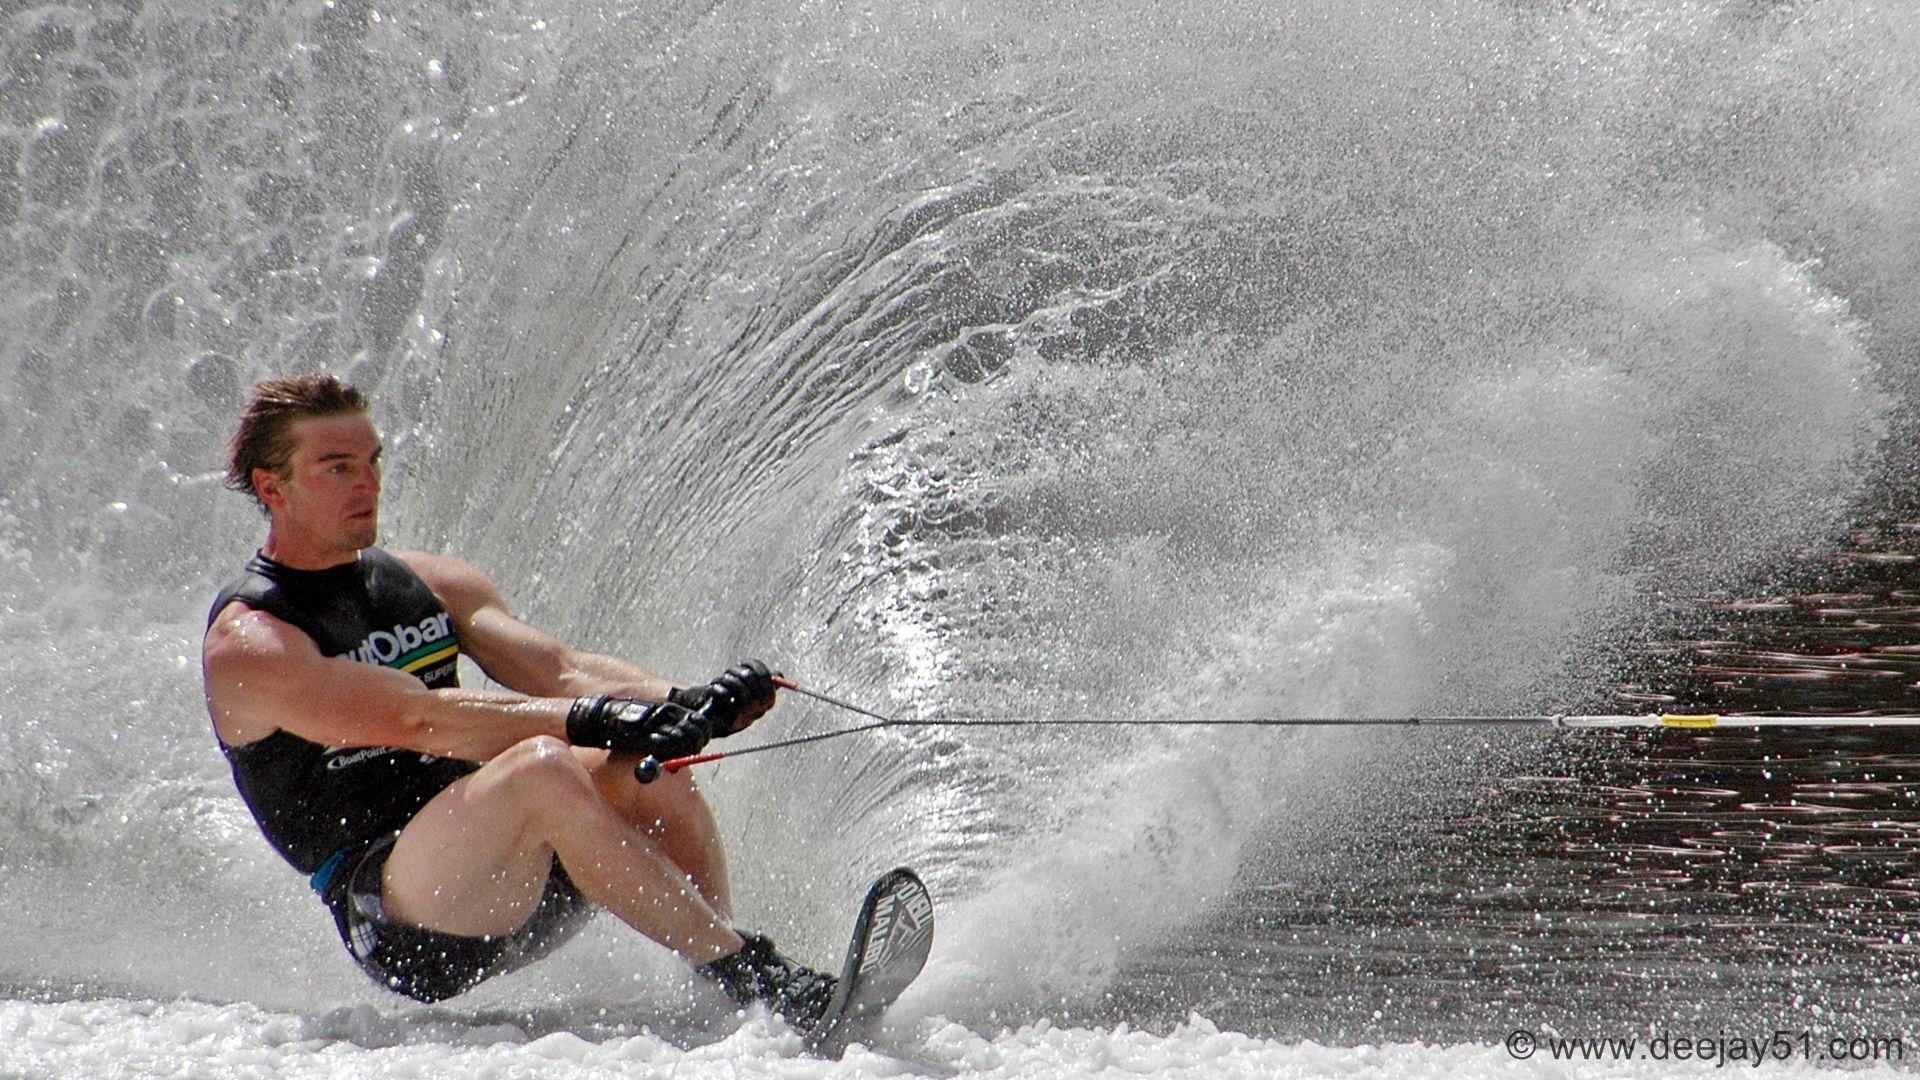 Moomba Water Festival, Melbourne. Skiing, Festivals